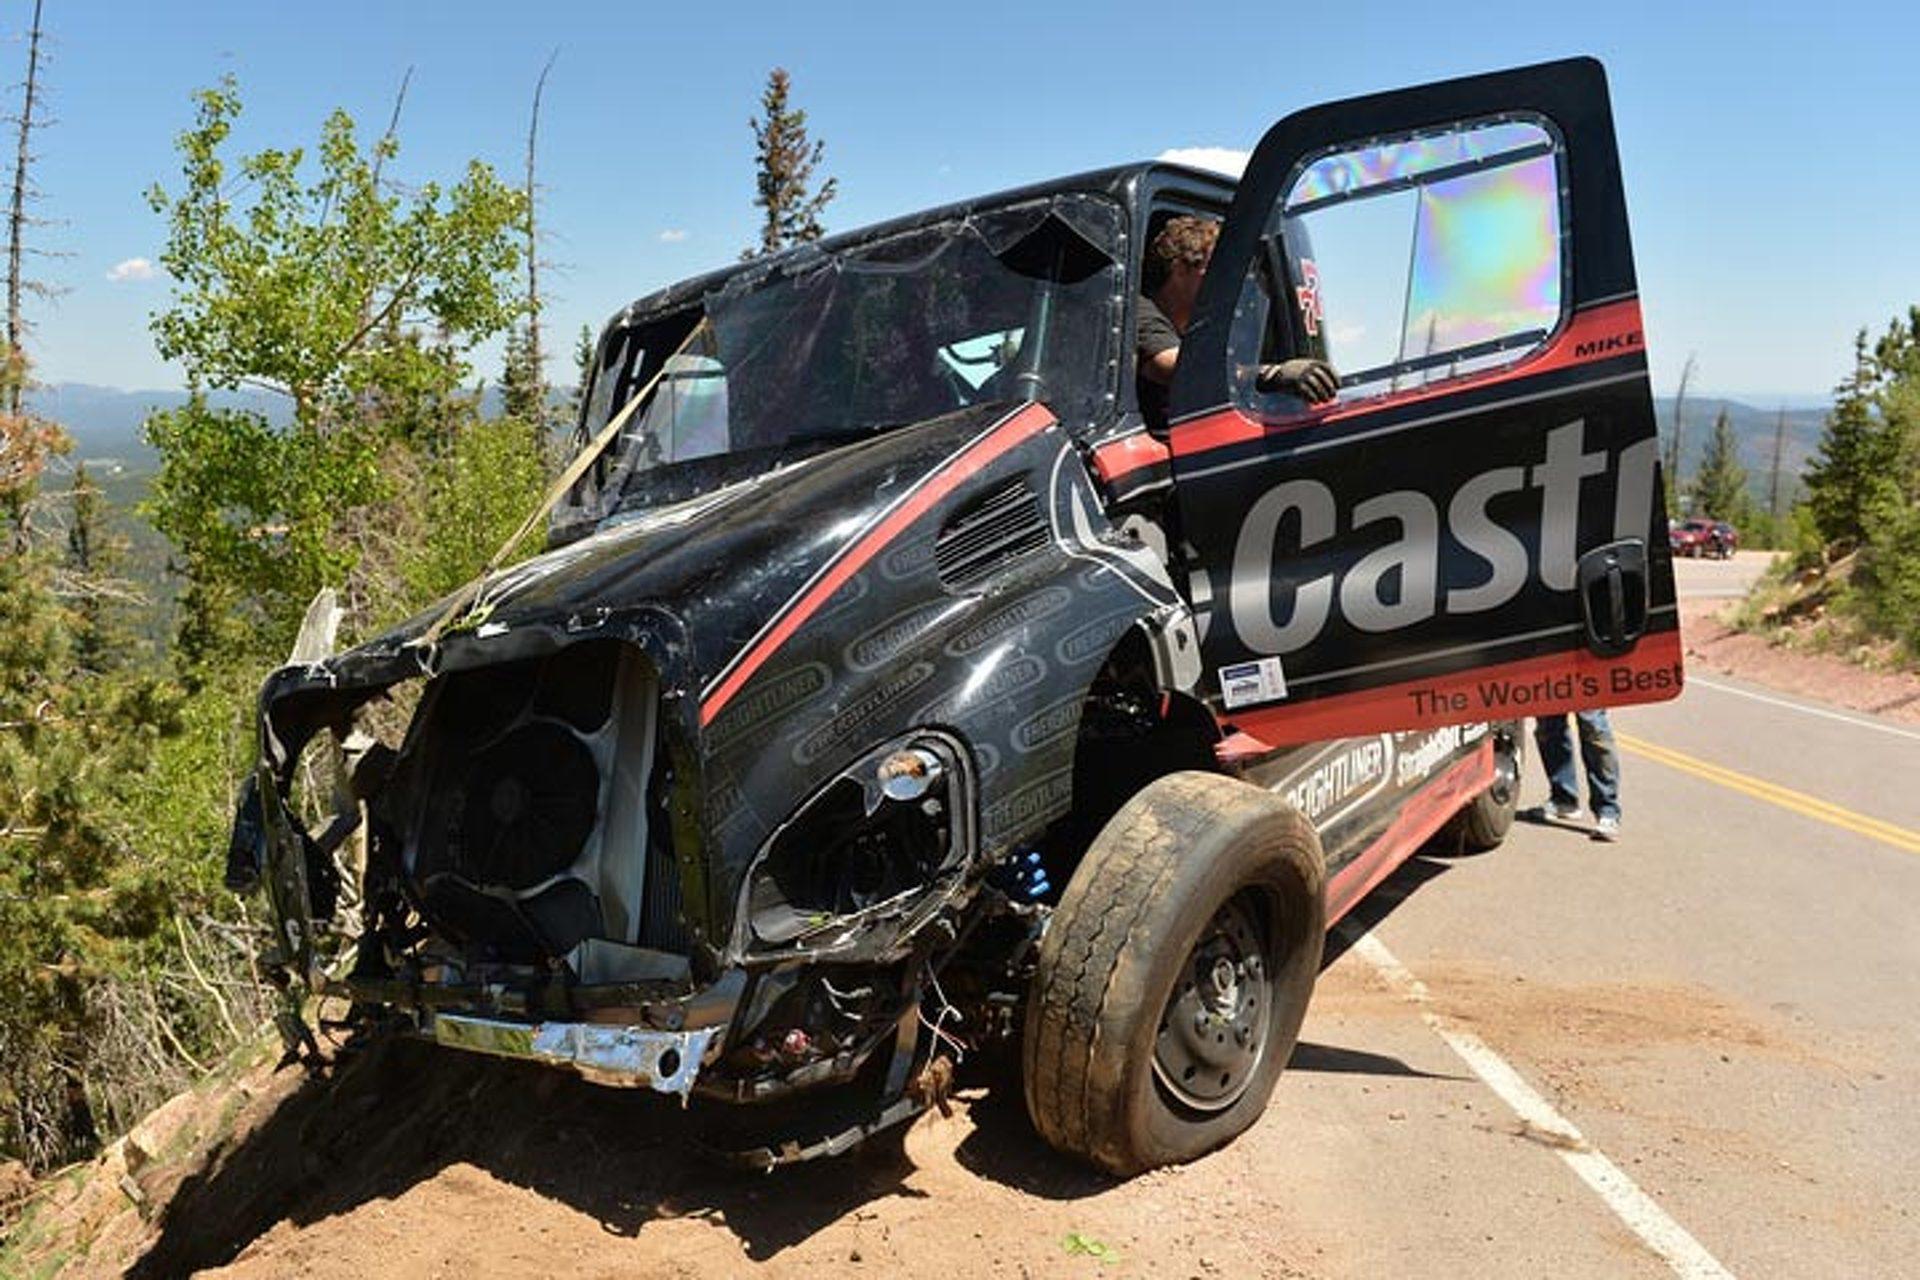 Mike Ryan's Pikes Peak Freightliner Crashes in Practice